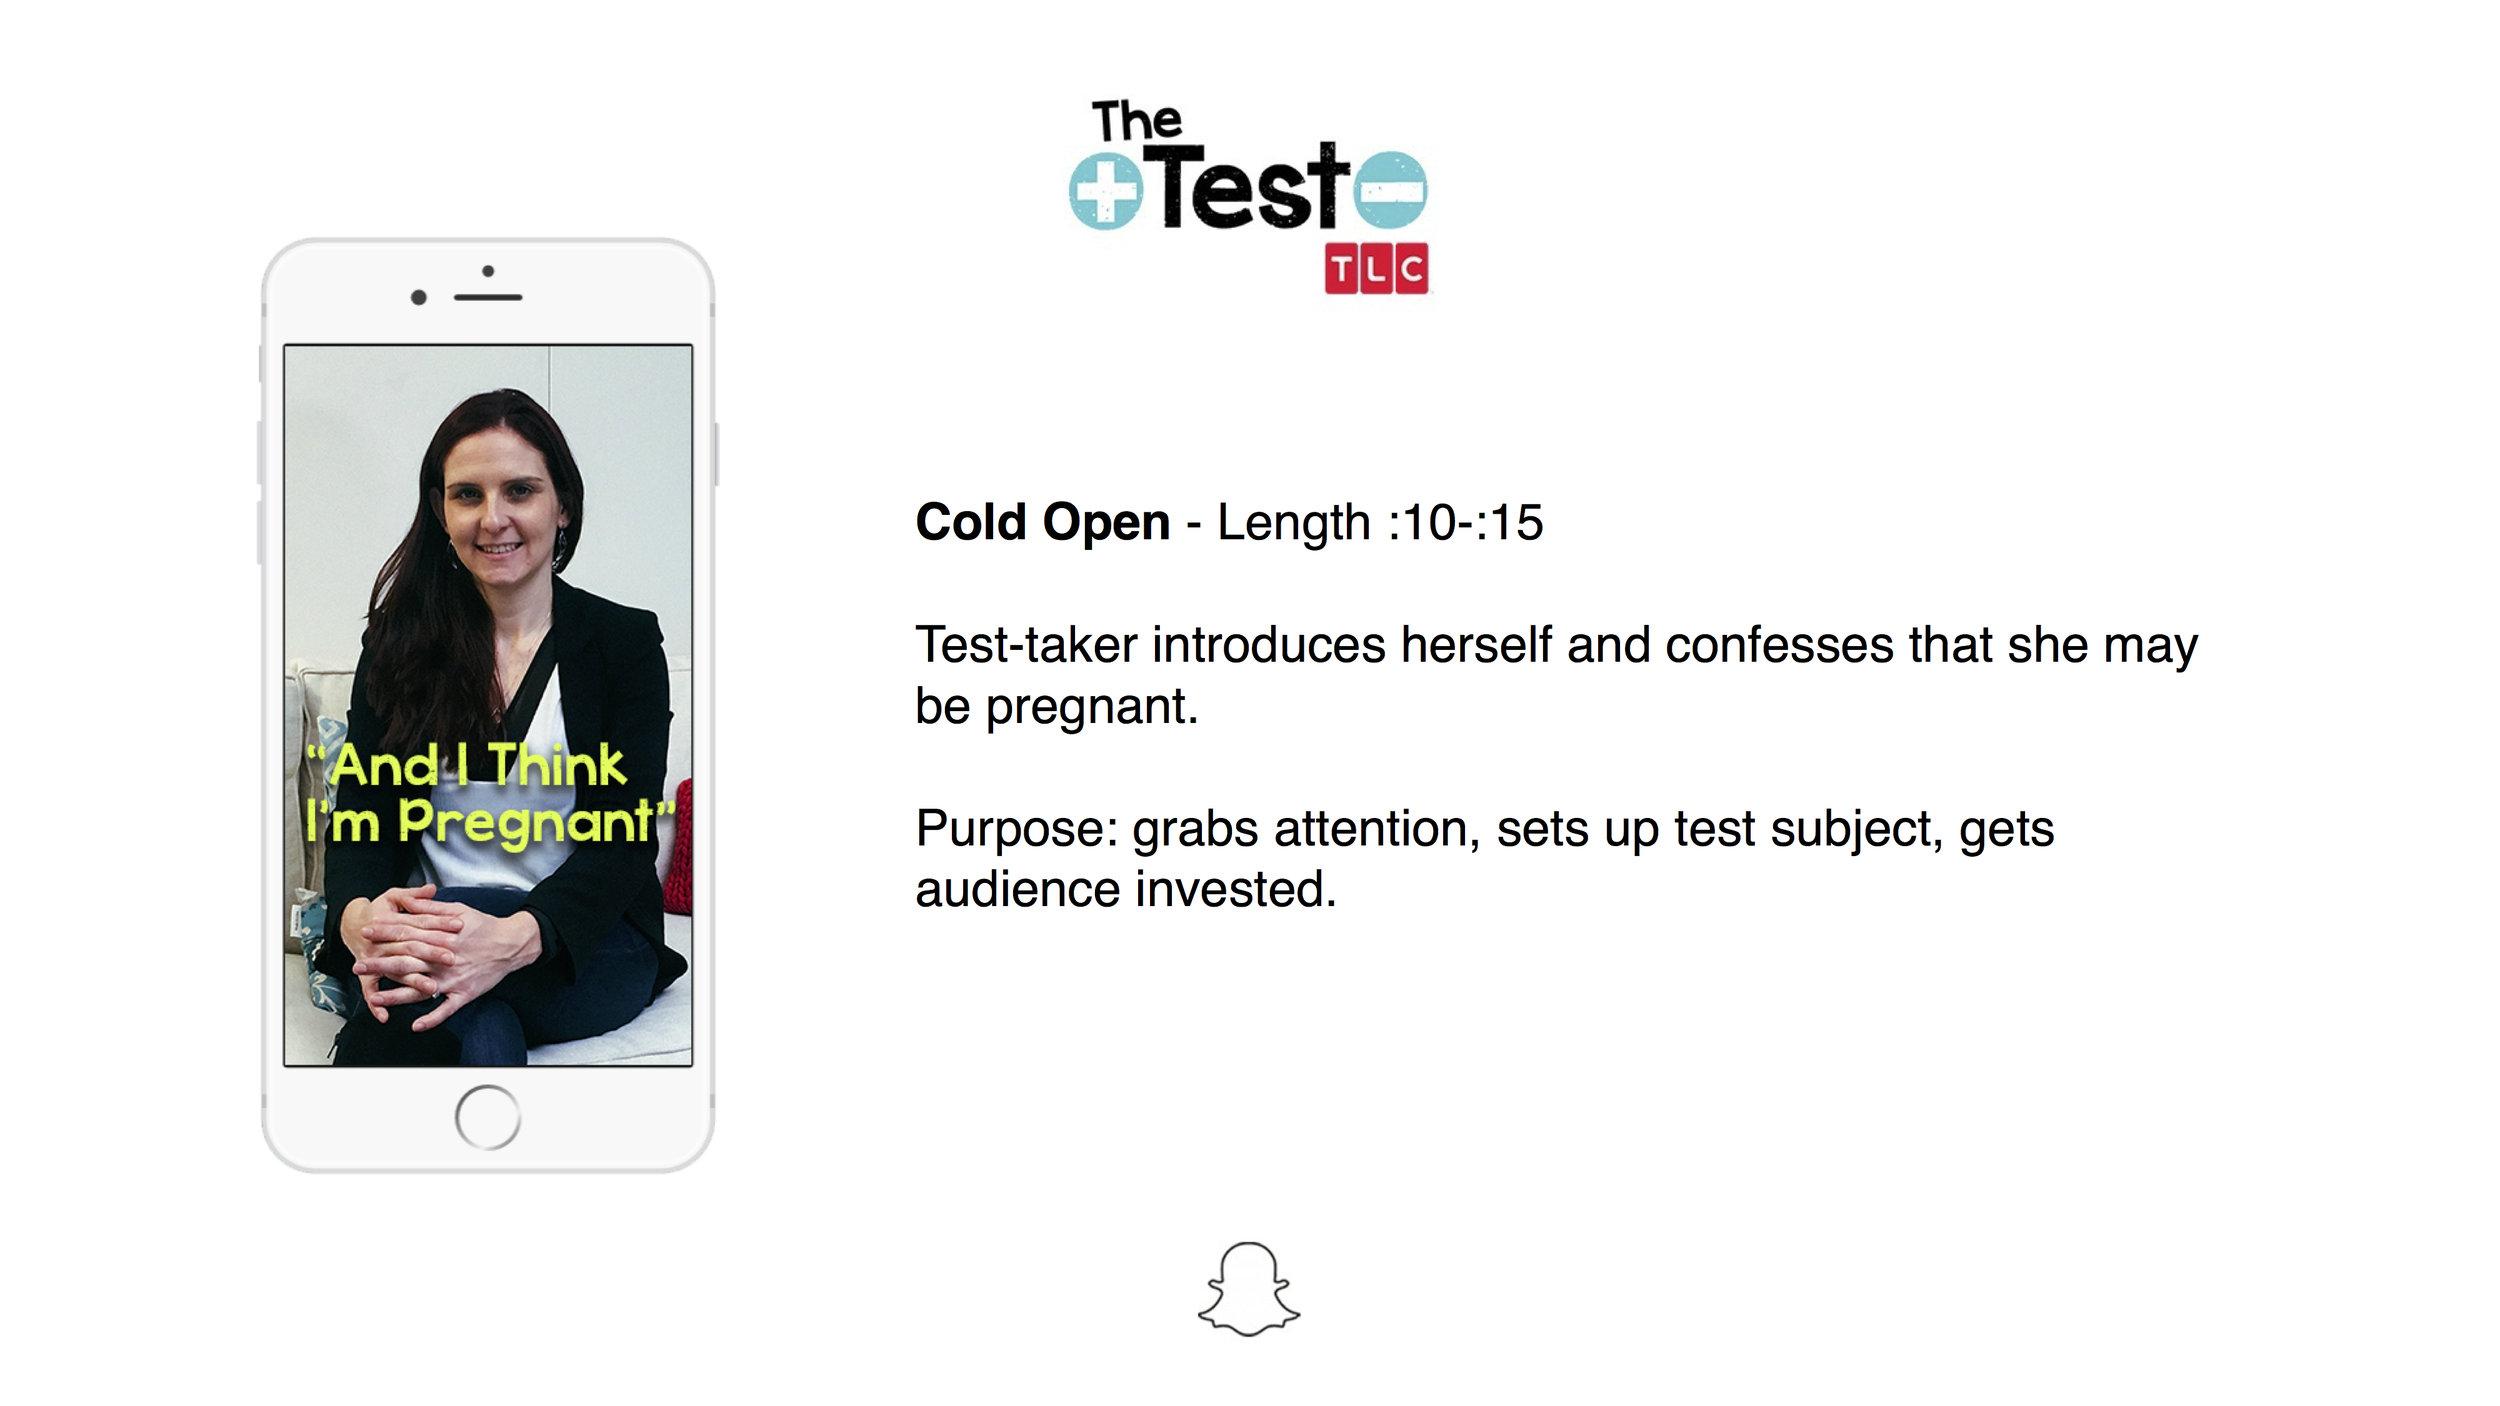 TLC_TEST_R5_pg2.jpg